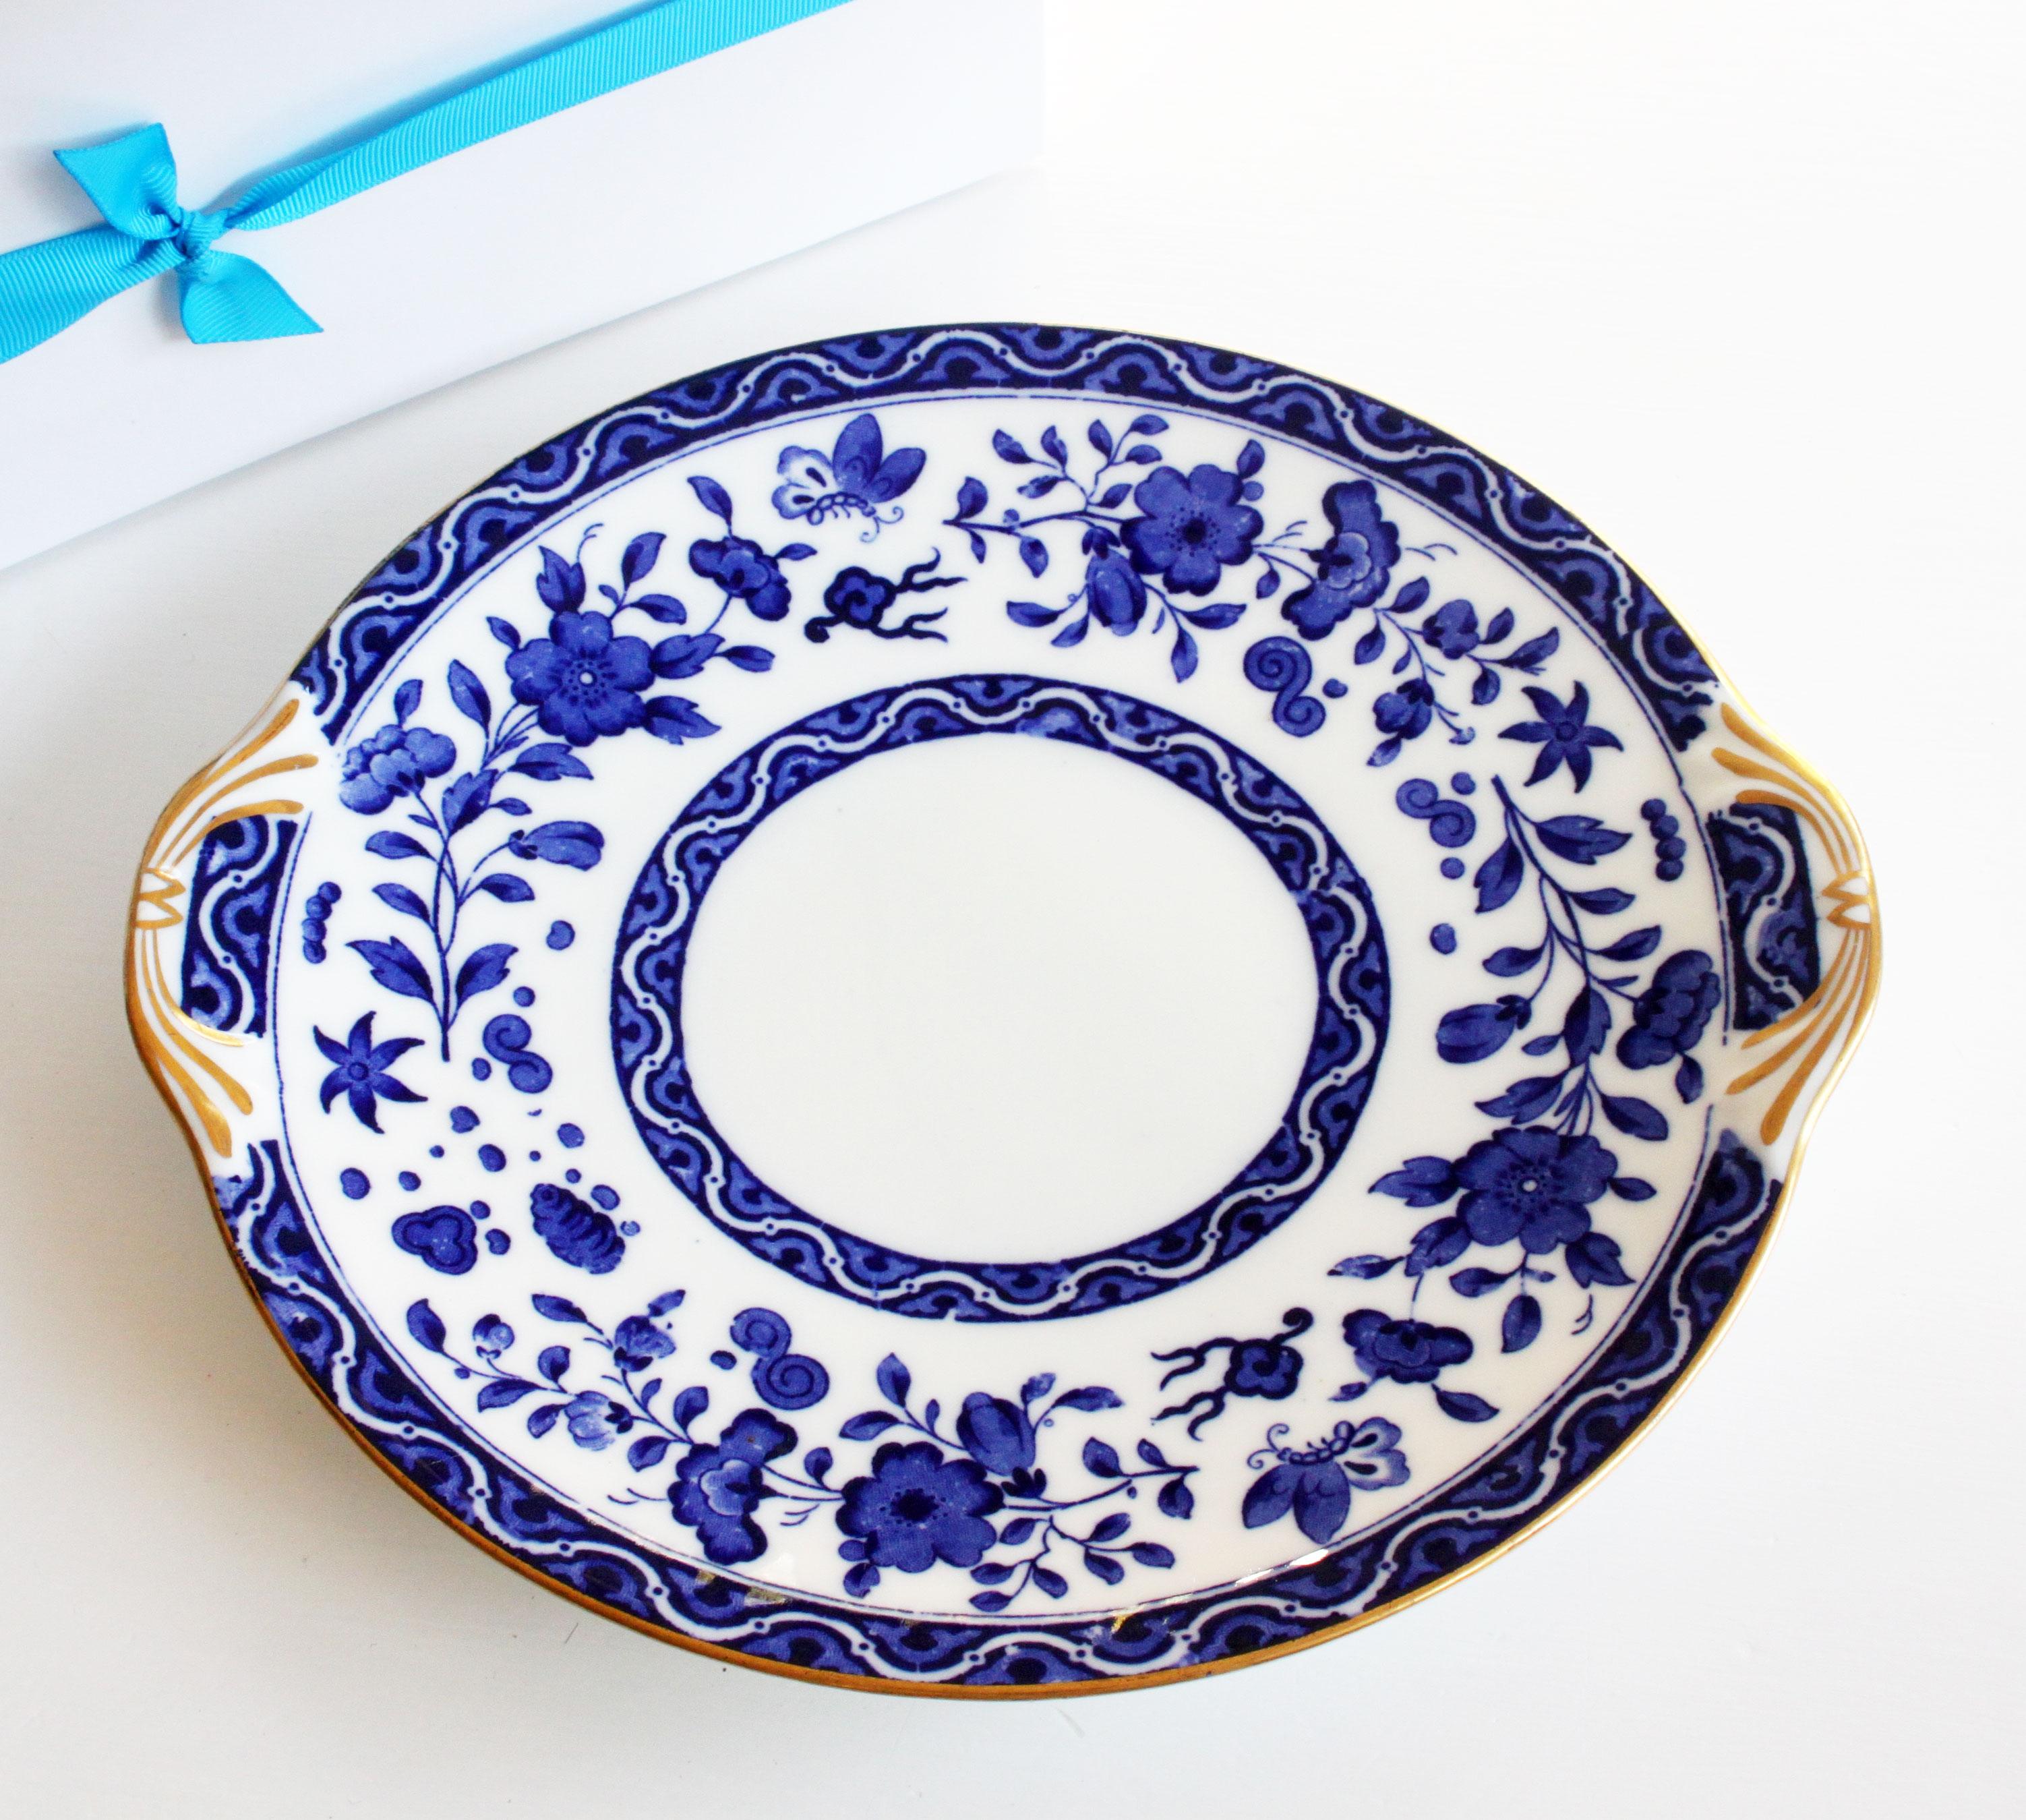 (CP007) ROYAL DOULTON antique / vintage cake plate £25.00  sc 1 st  Tara Honeywill Vintage China & Tara Honeywill Vintage China